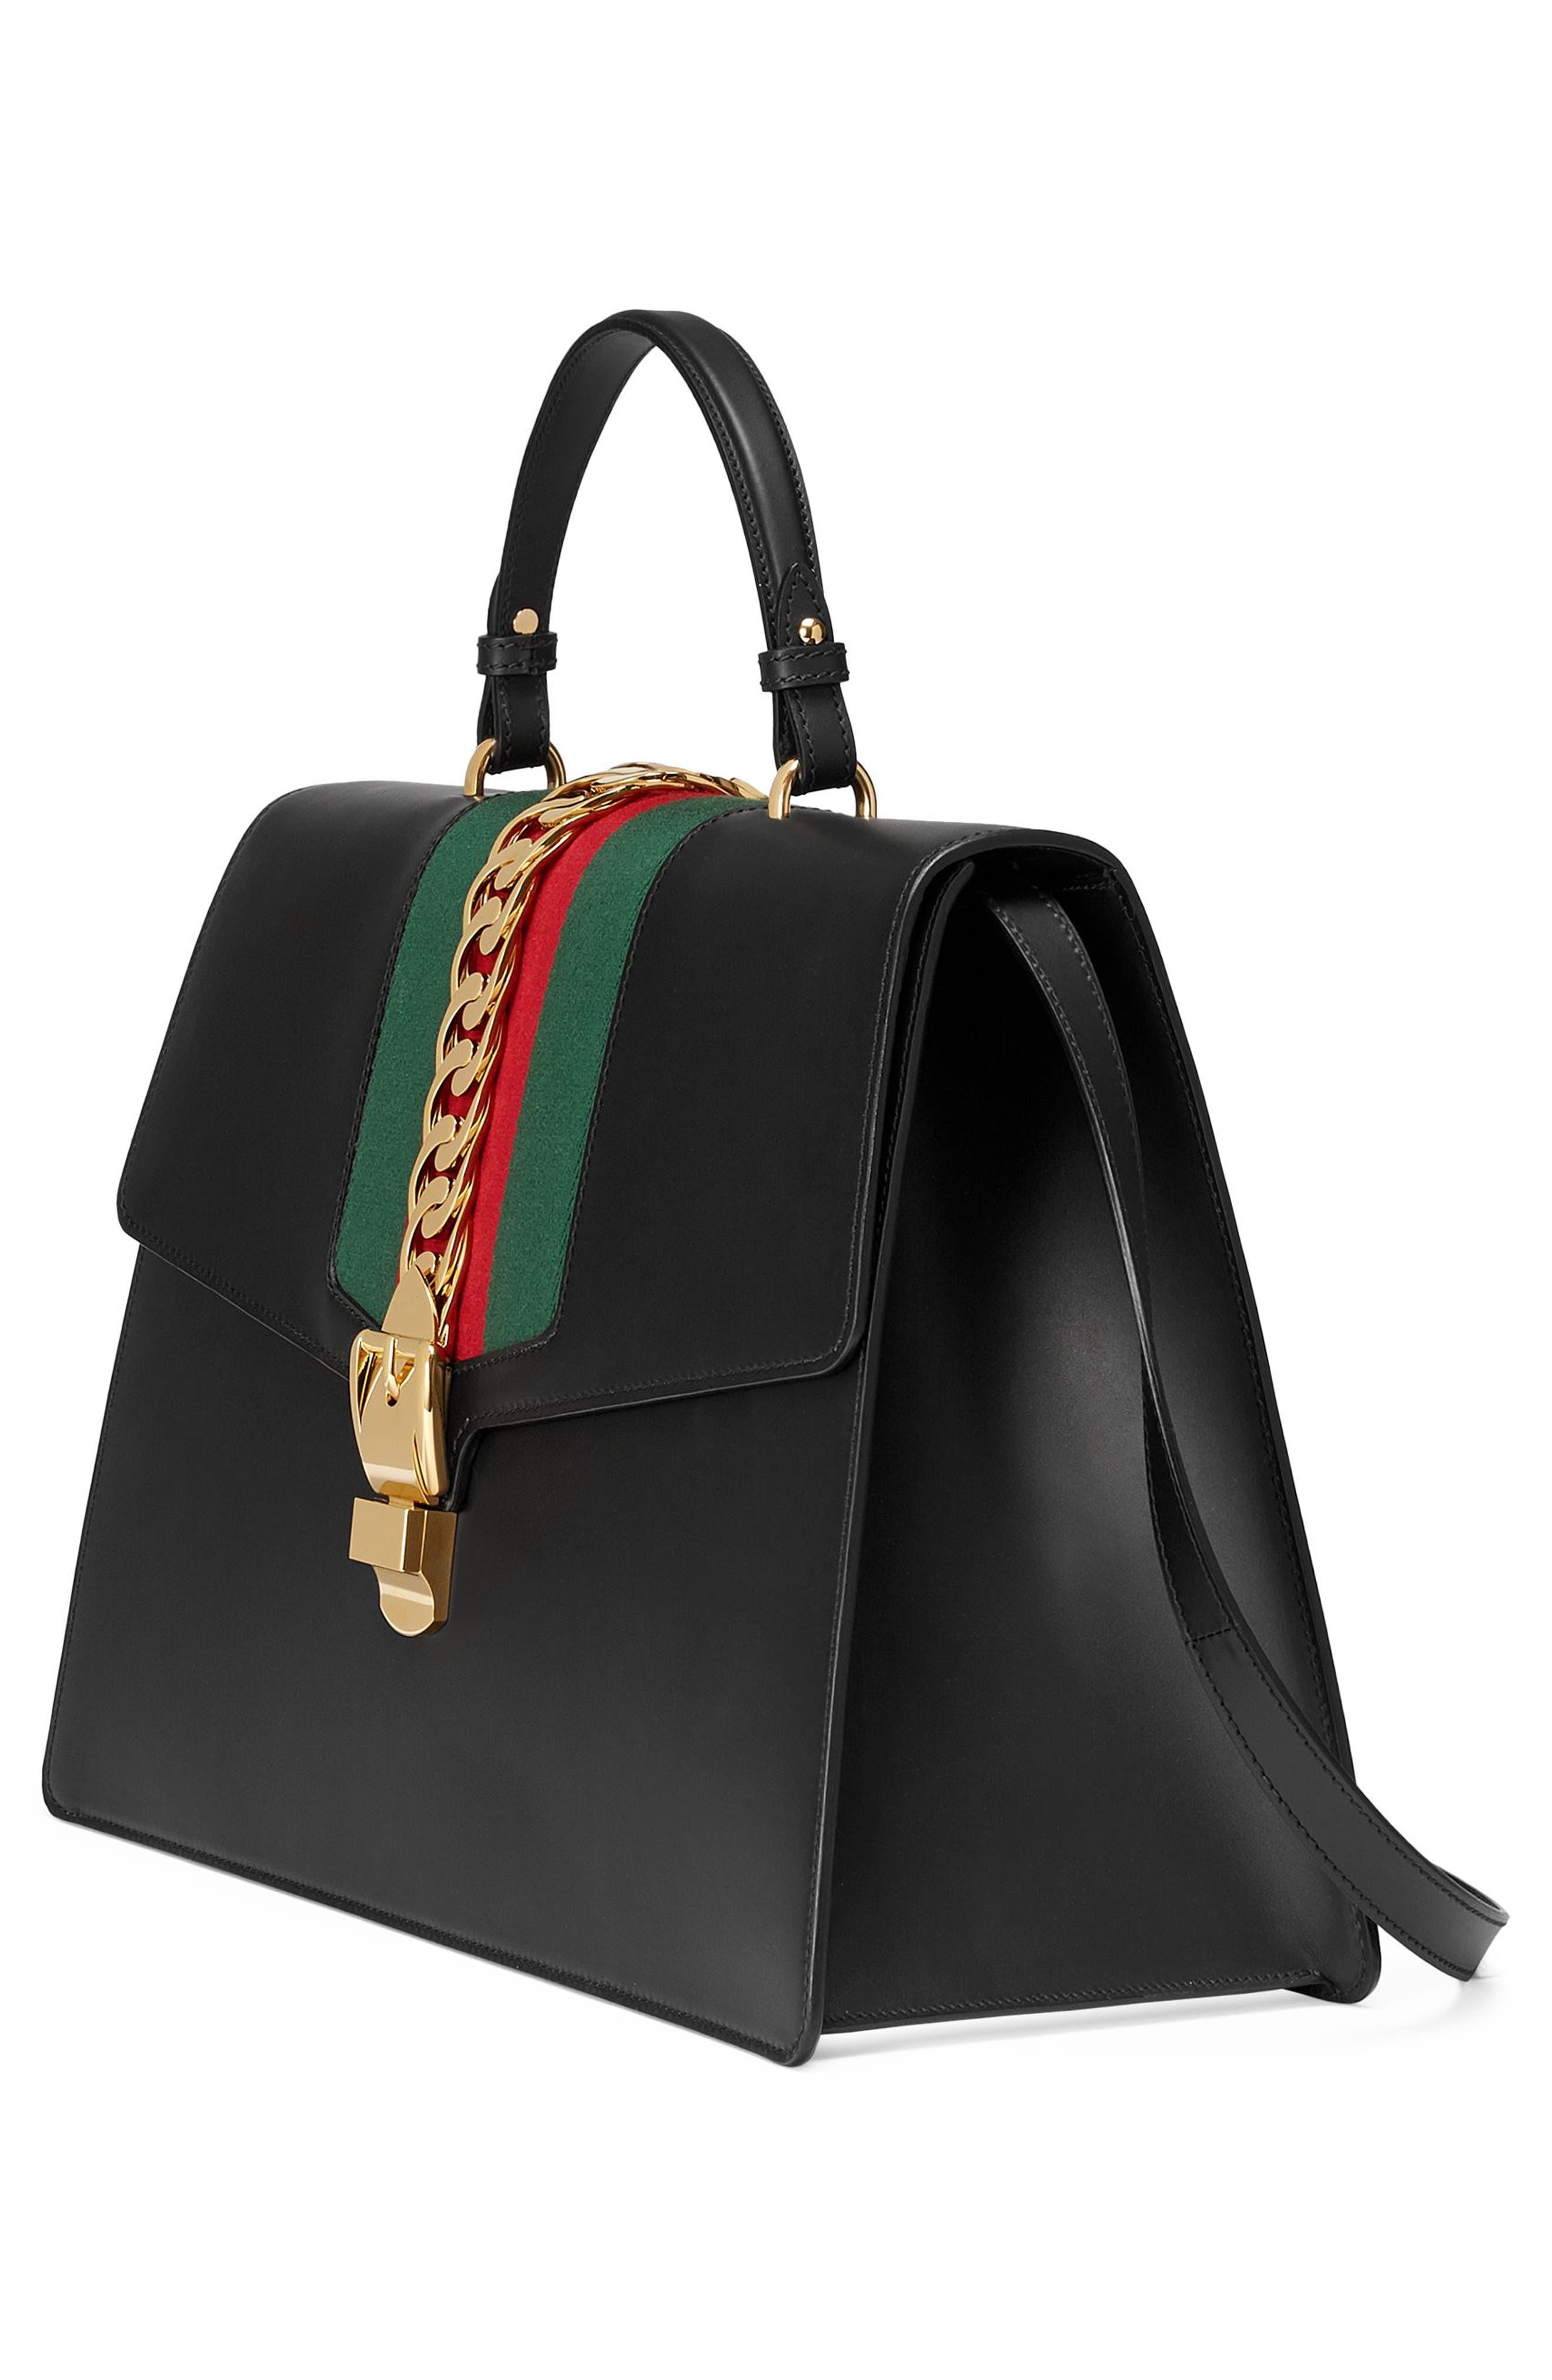 Maxi Sylvie Top Handle Leather Shoulder Bag,                             Alternate thumbnail 5, color,                             NERO/ VERT RED